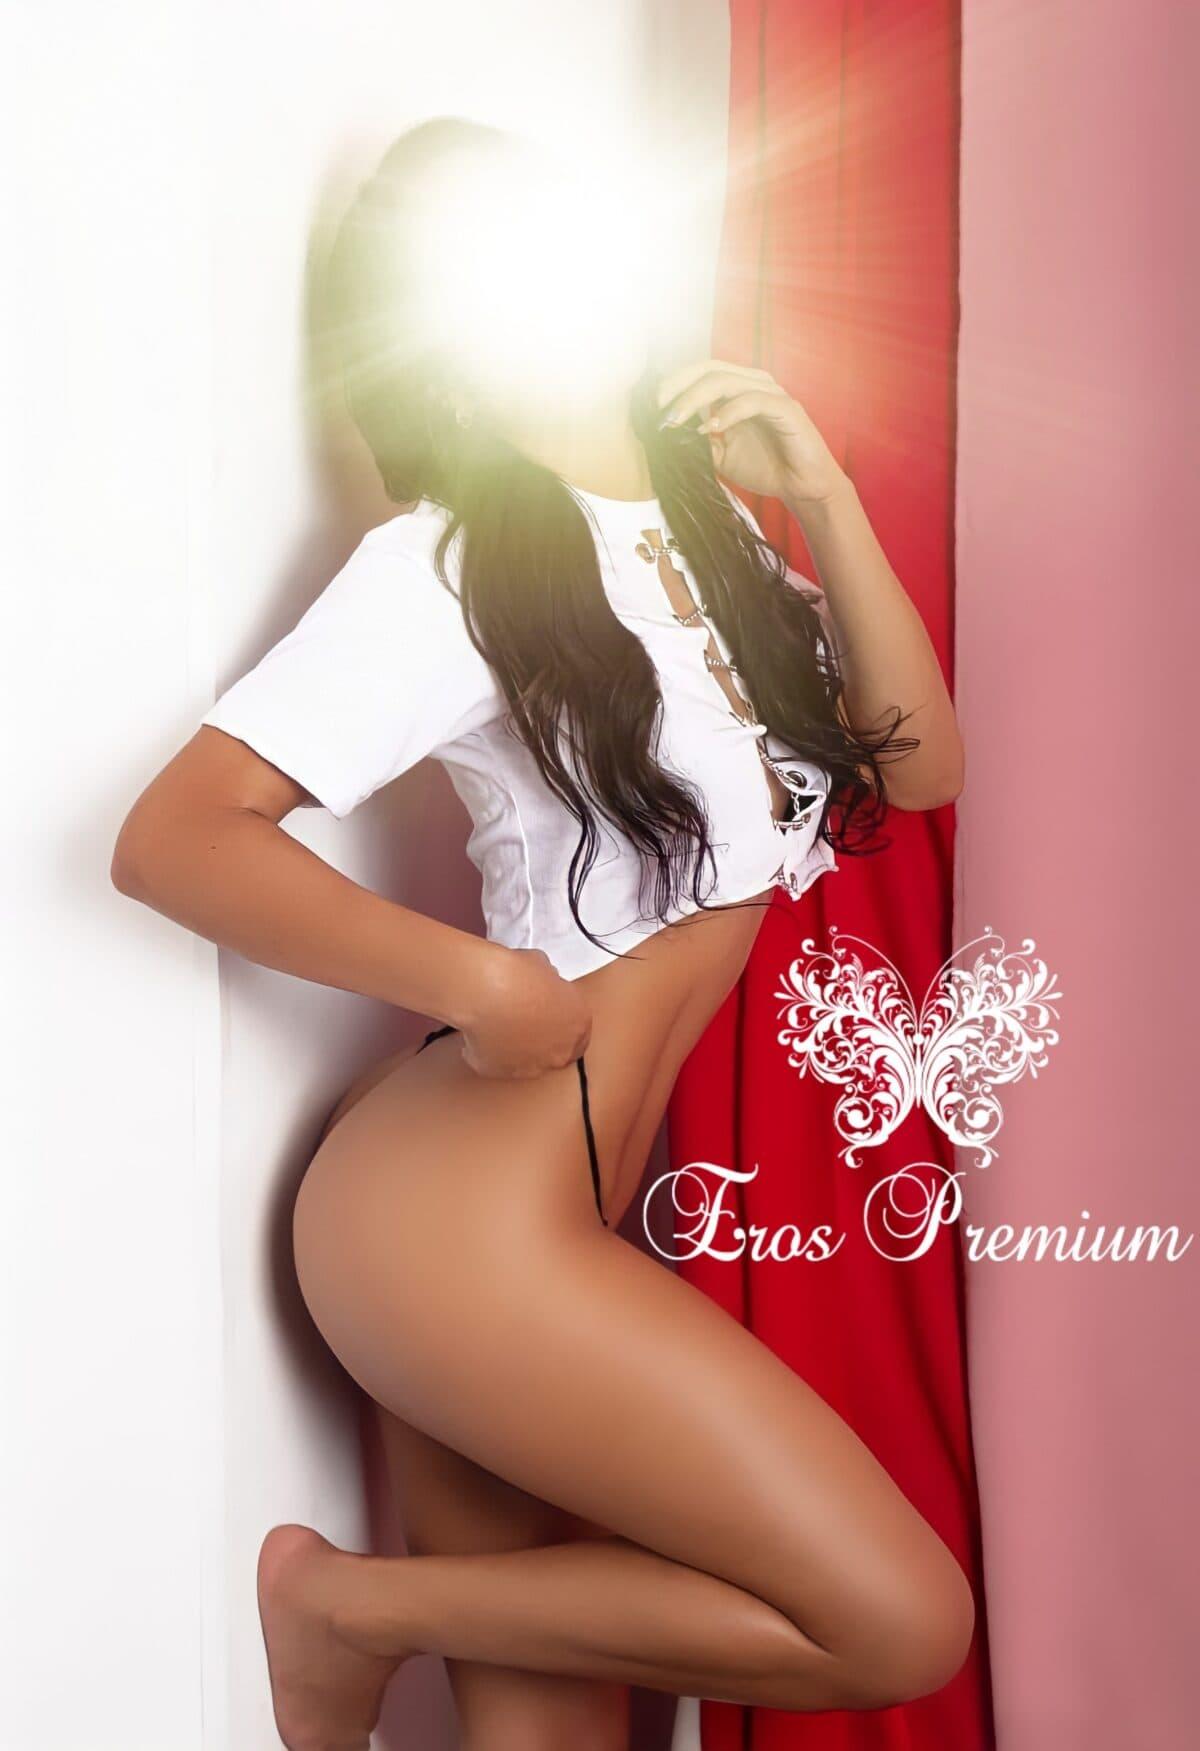 Kloe Modelo Prepago en Cali - Colombia - Eros Premium